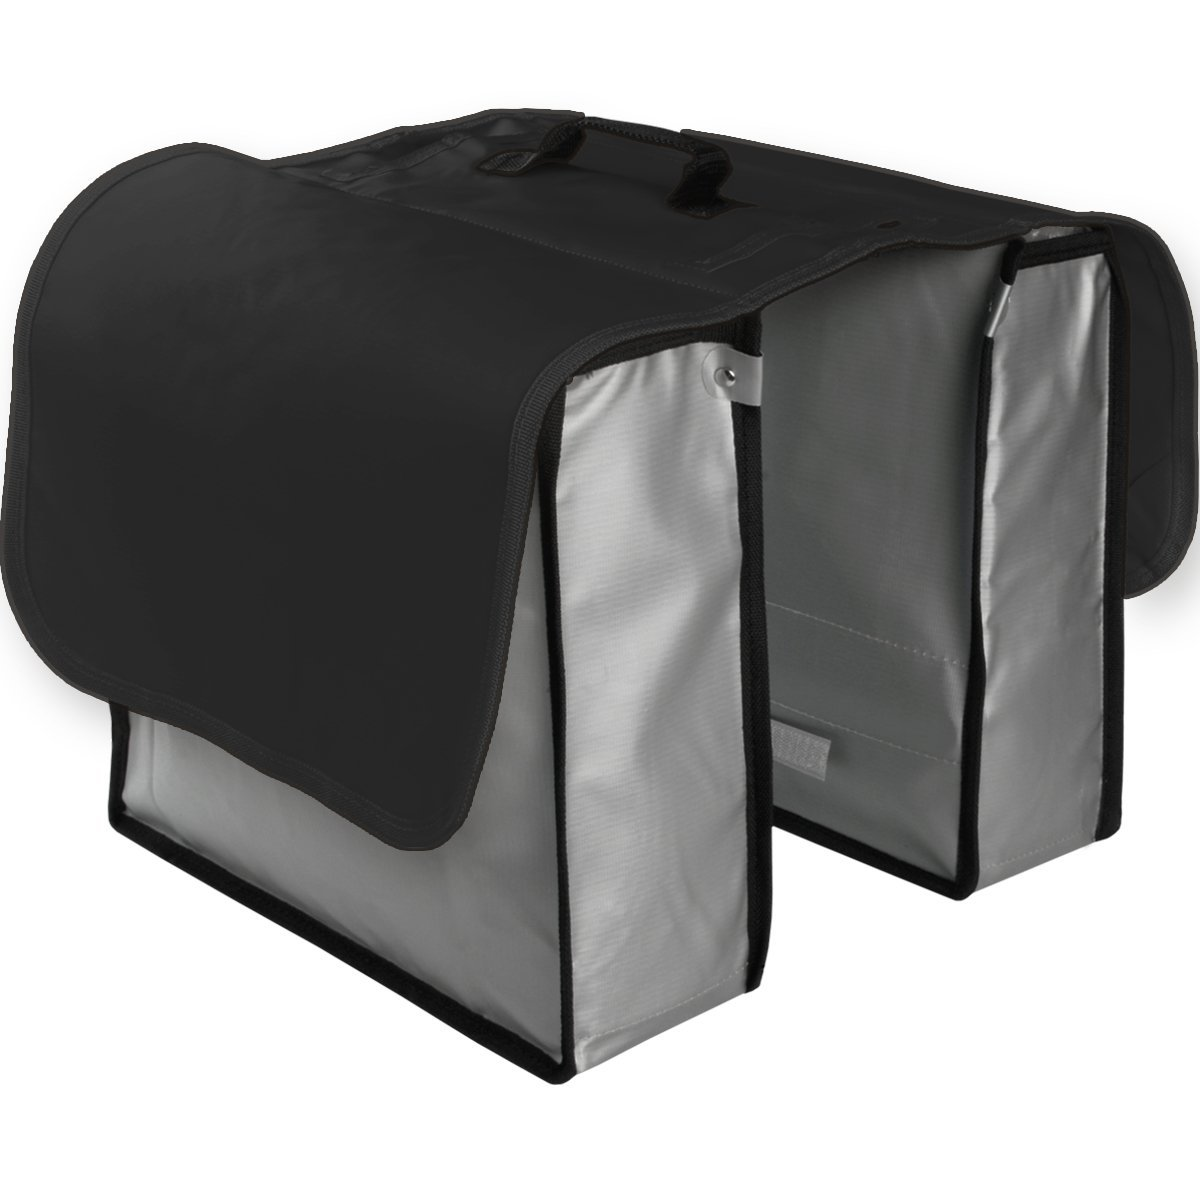 Filmer Gepäckträgertasche aus Tarpaulin